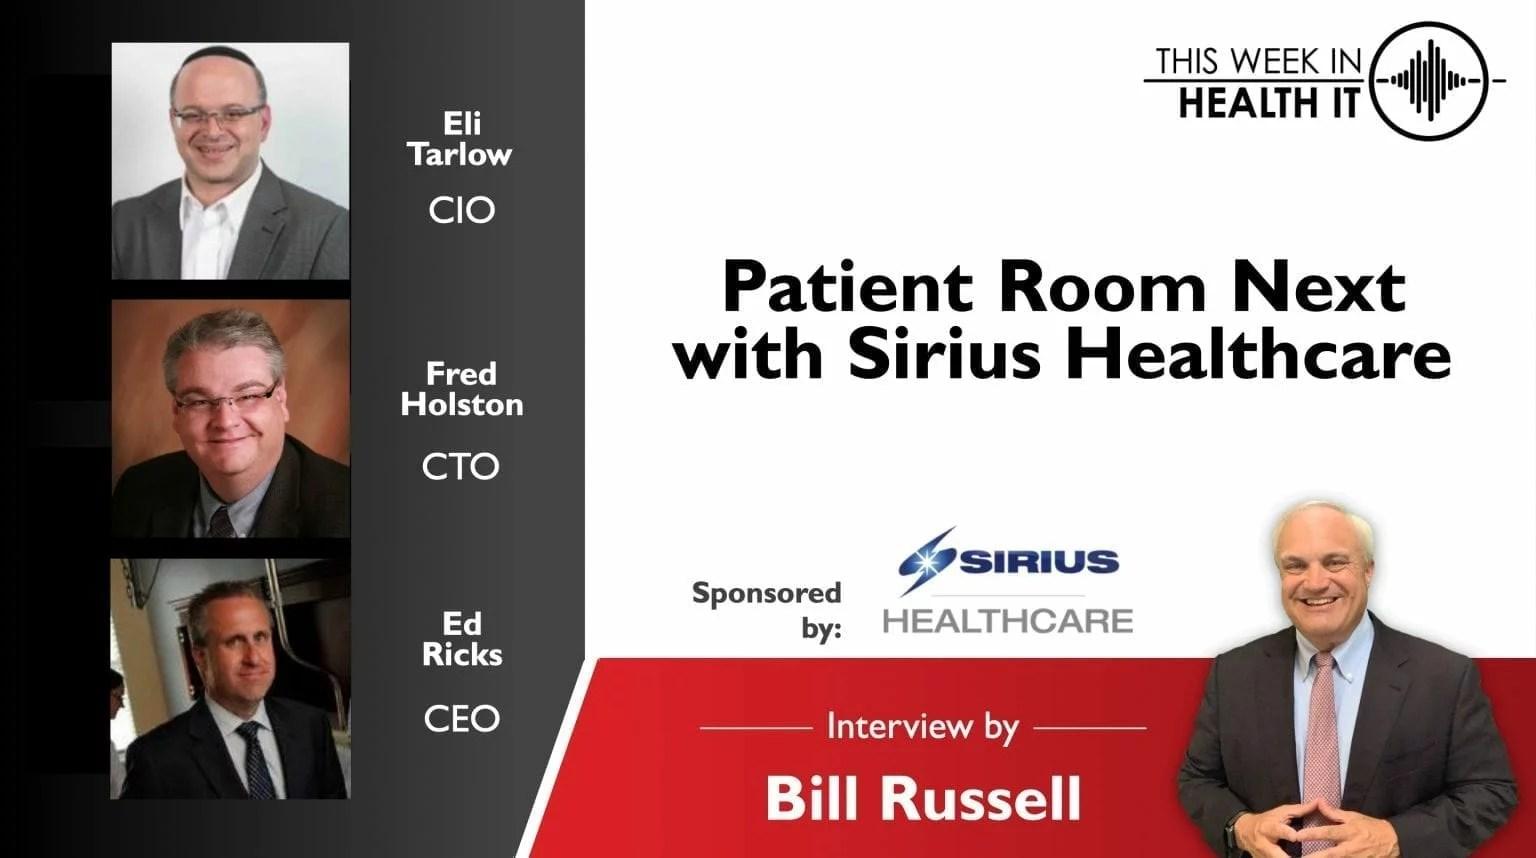 Ed Ricks, Eli Tarlow, Fred Holston, Bill Russell, This Week in Health IT